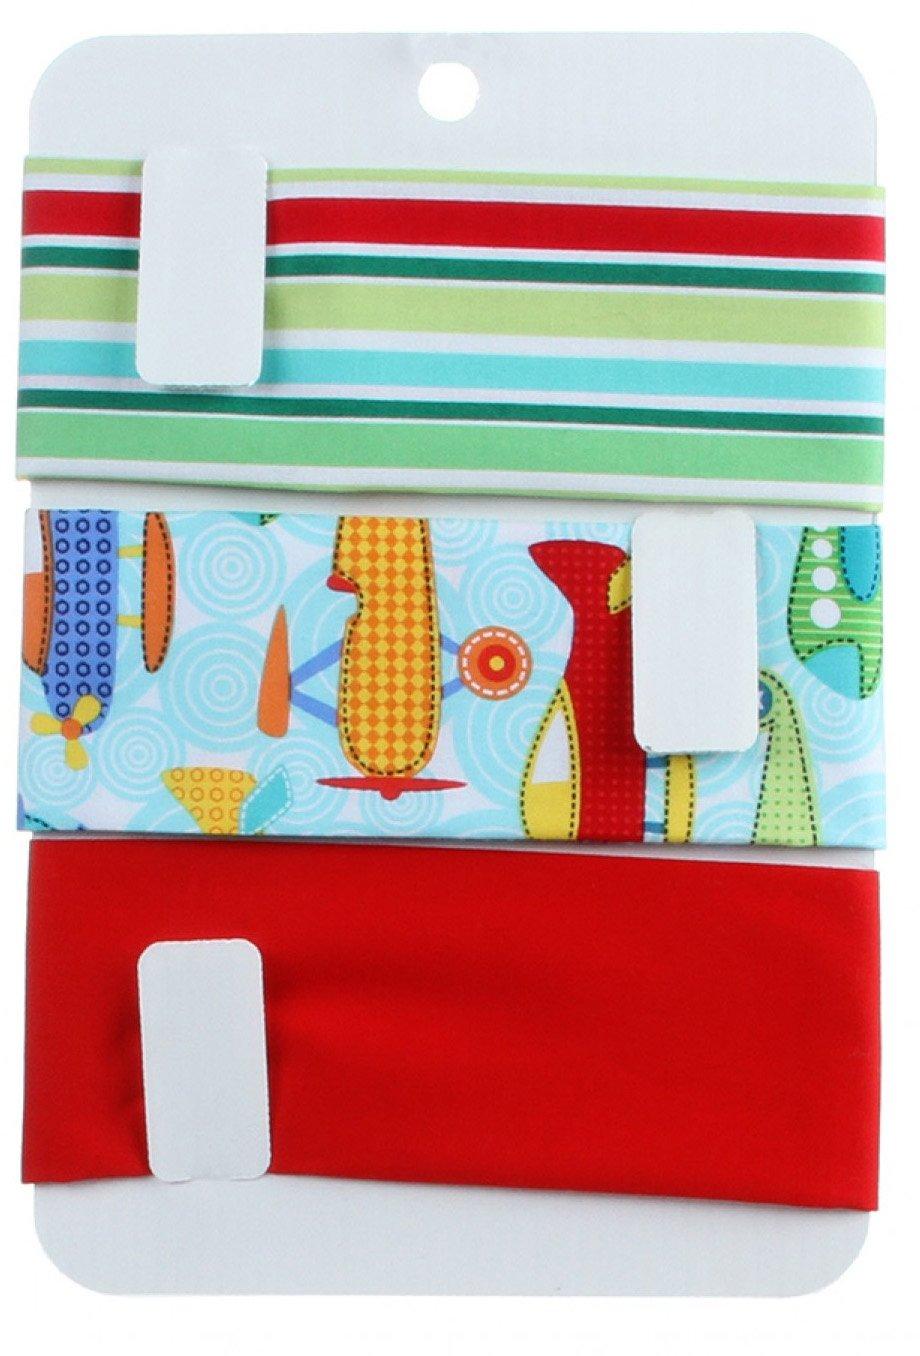 Uncategorized The Fabric Organizer amazon com fabric organizer boards shorty 10 12 inch x 7 package of 6